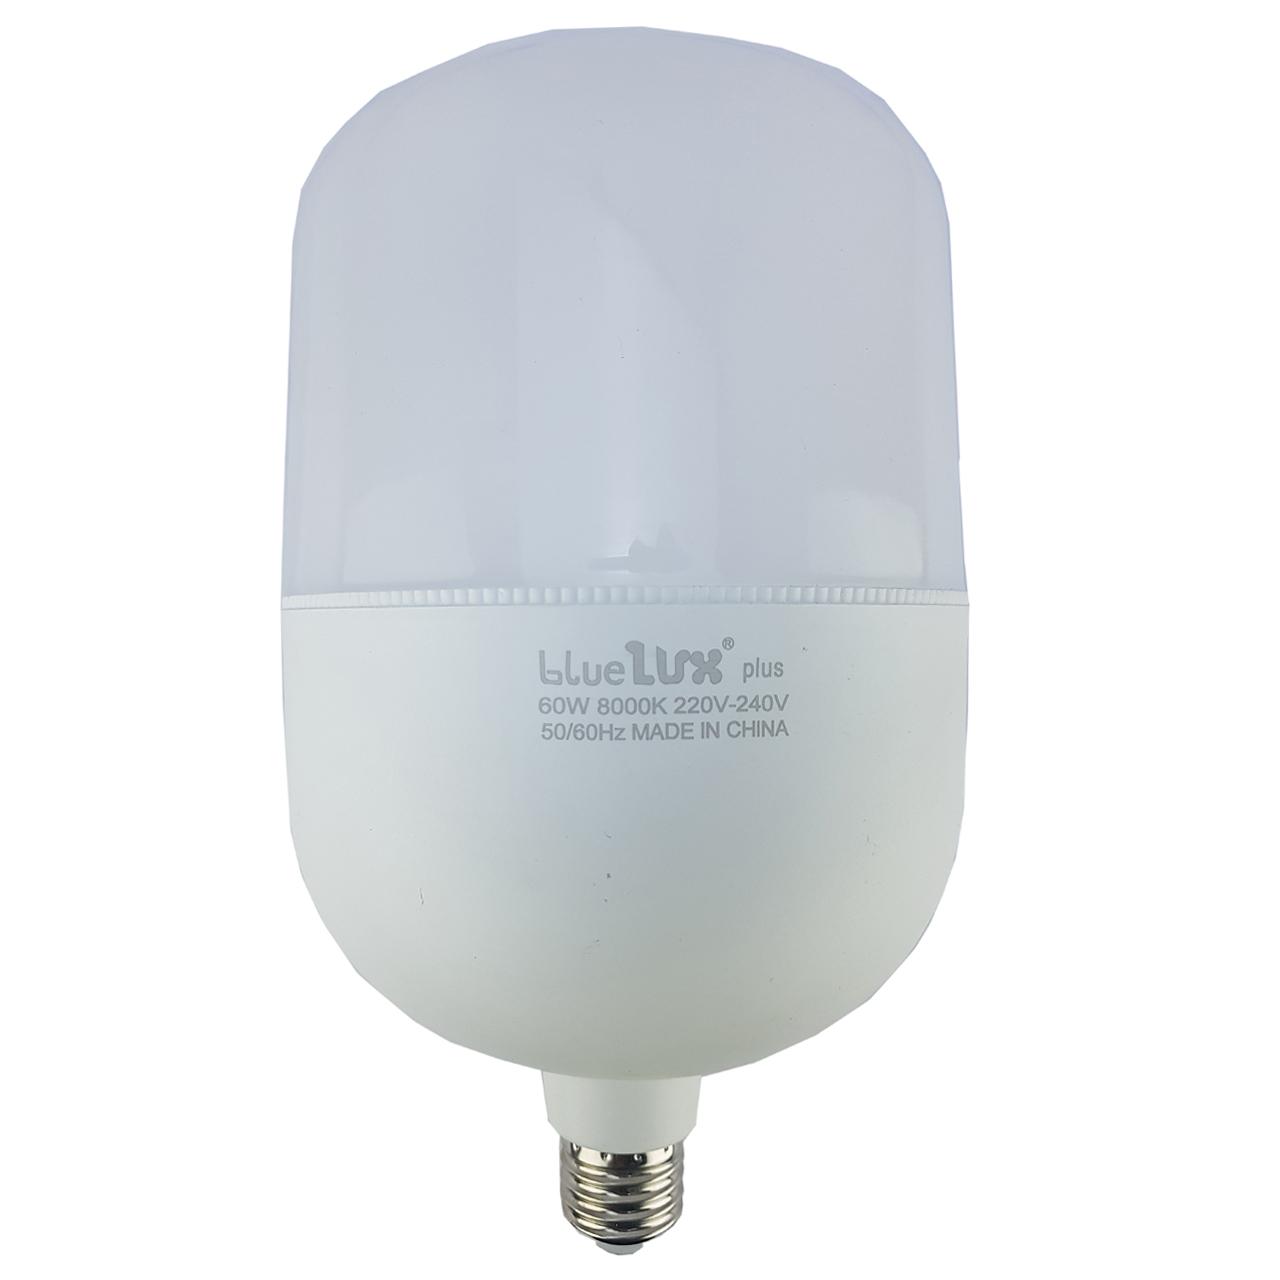 لامپ ال ای دی 60 وات بلو لوکس پلاس مدل T135 پایه E27